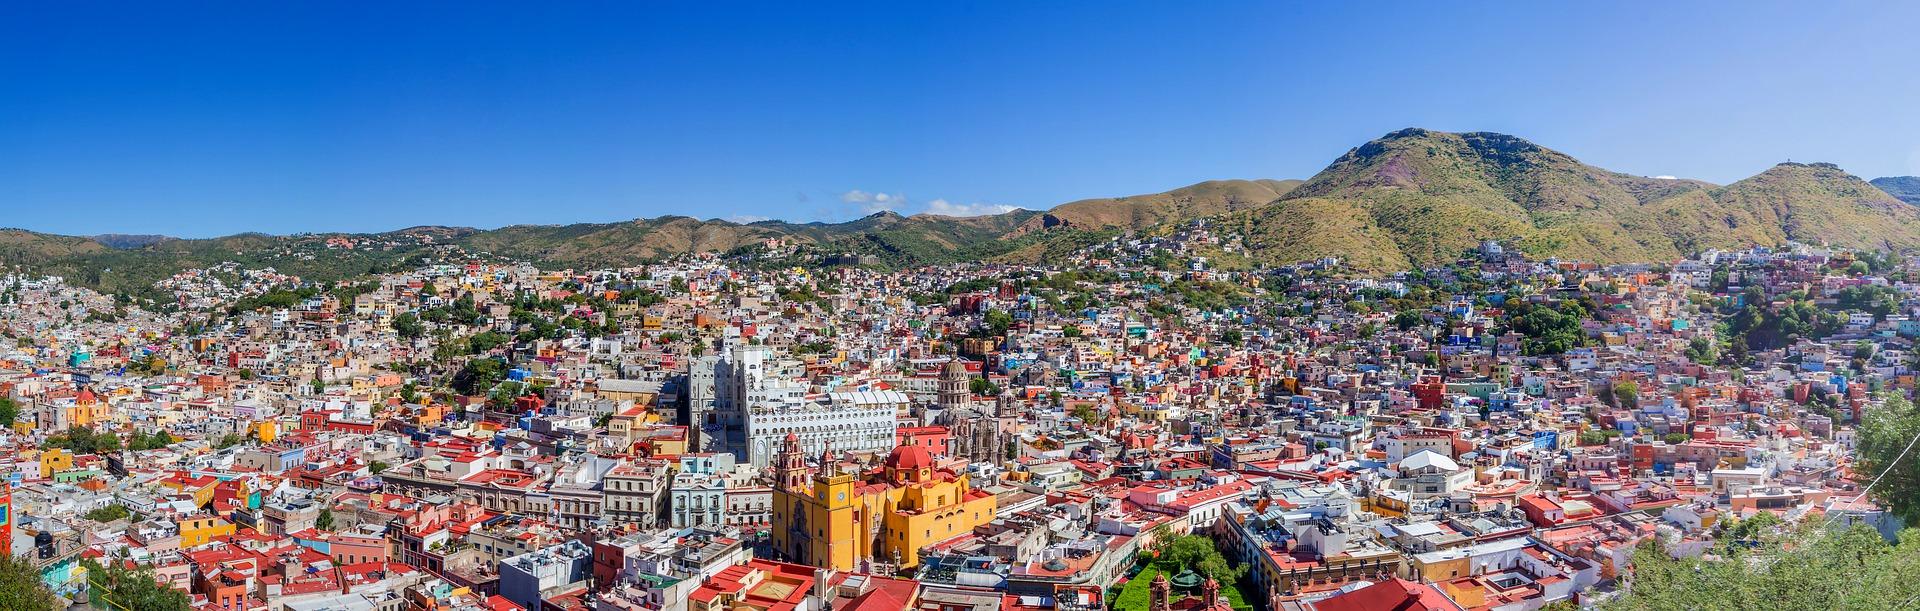 Guanajuato - kolorowe miasto w Meksysku